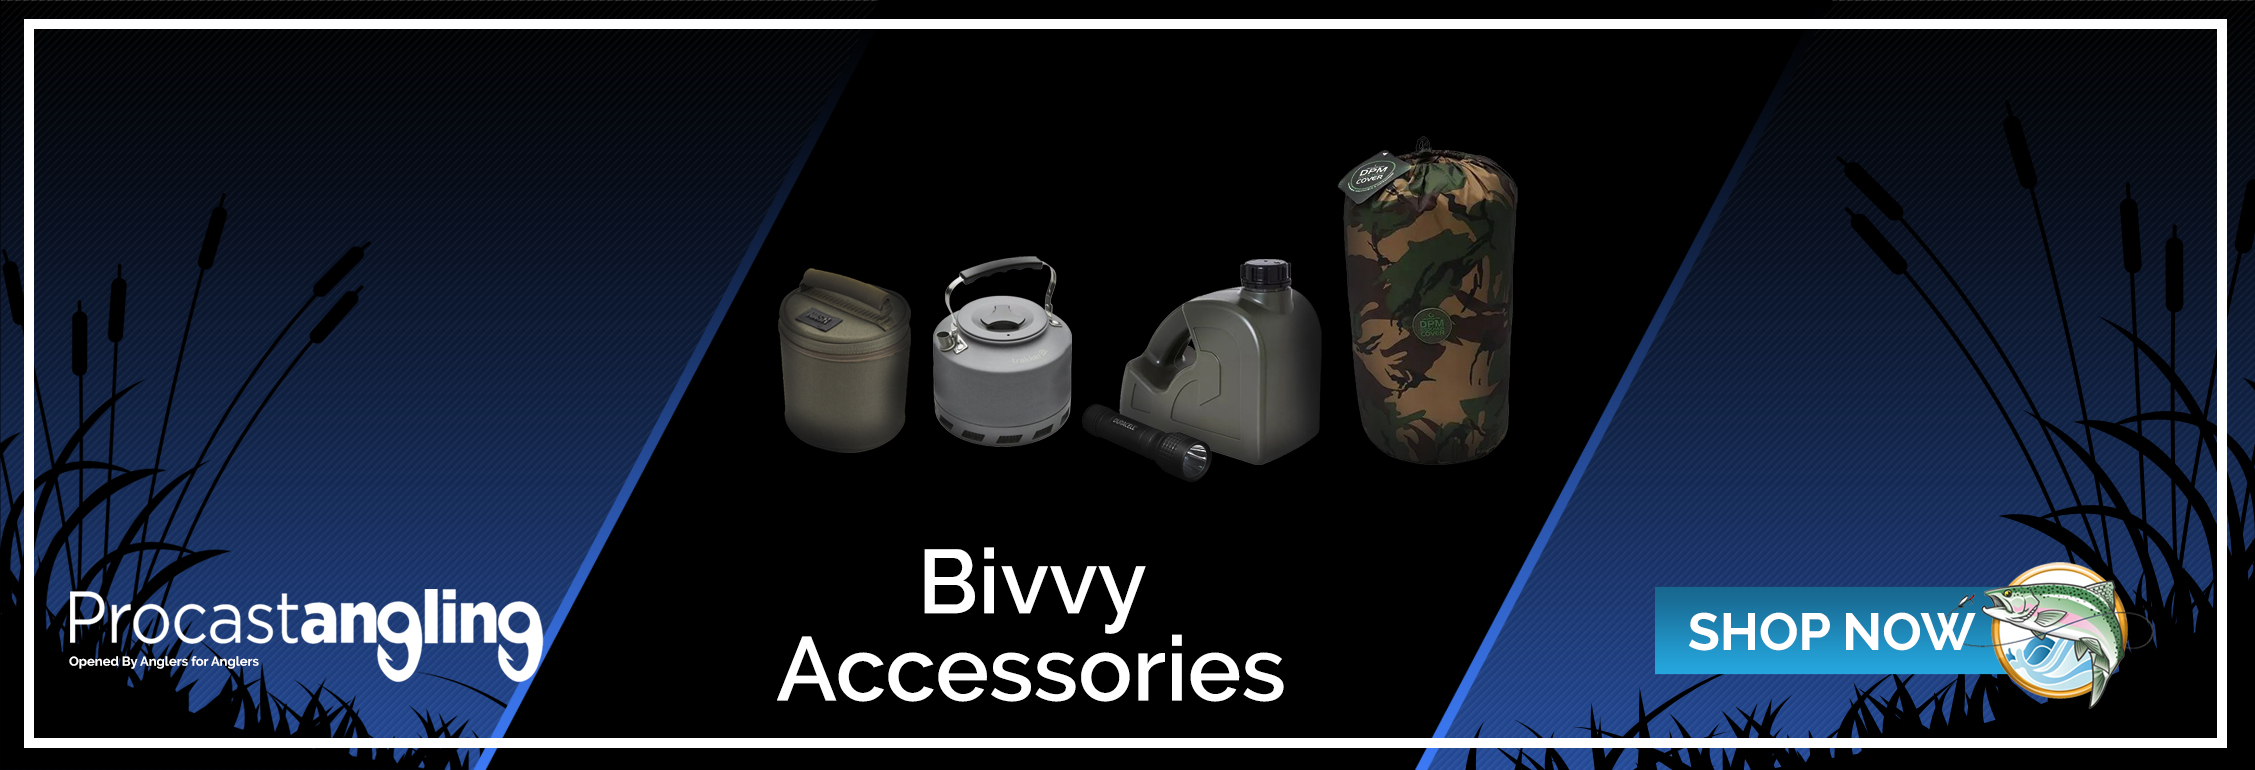 BIVVY ACCESSORIES